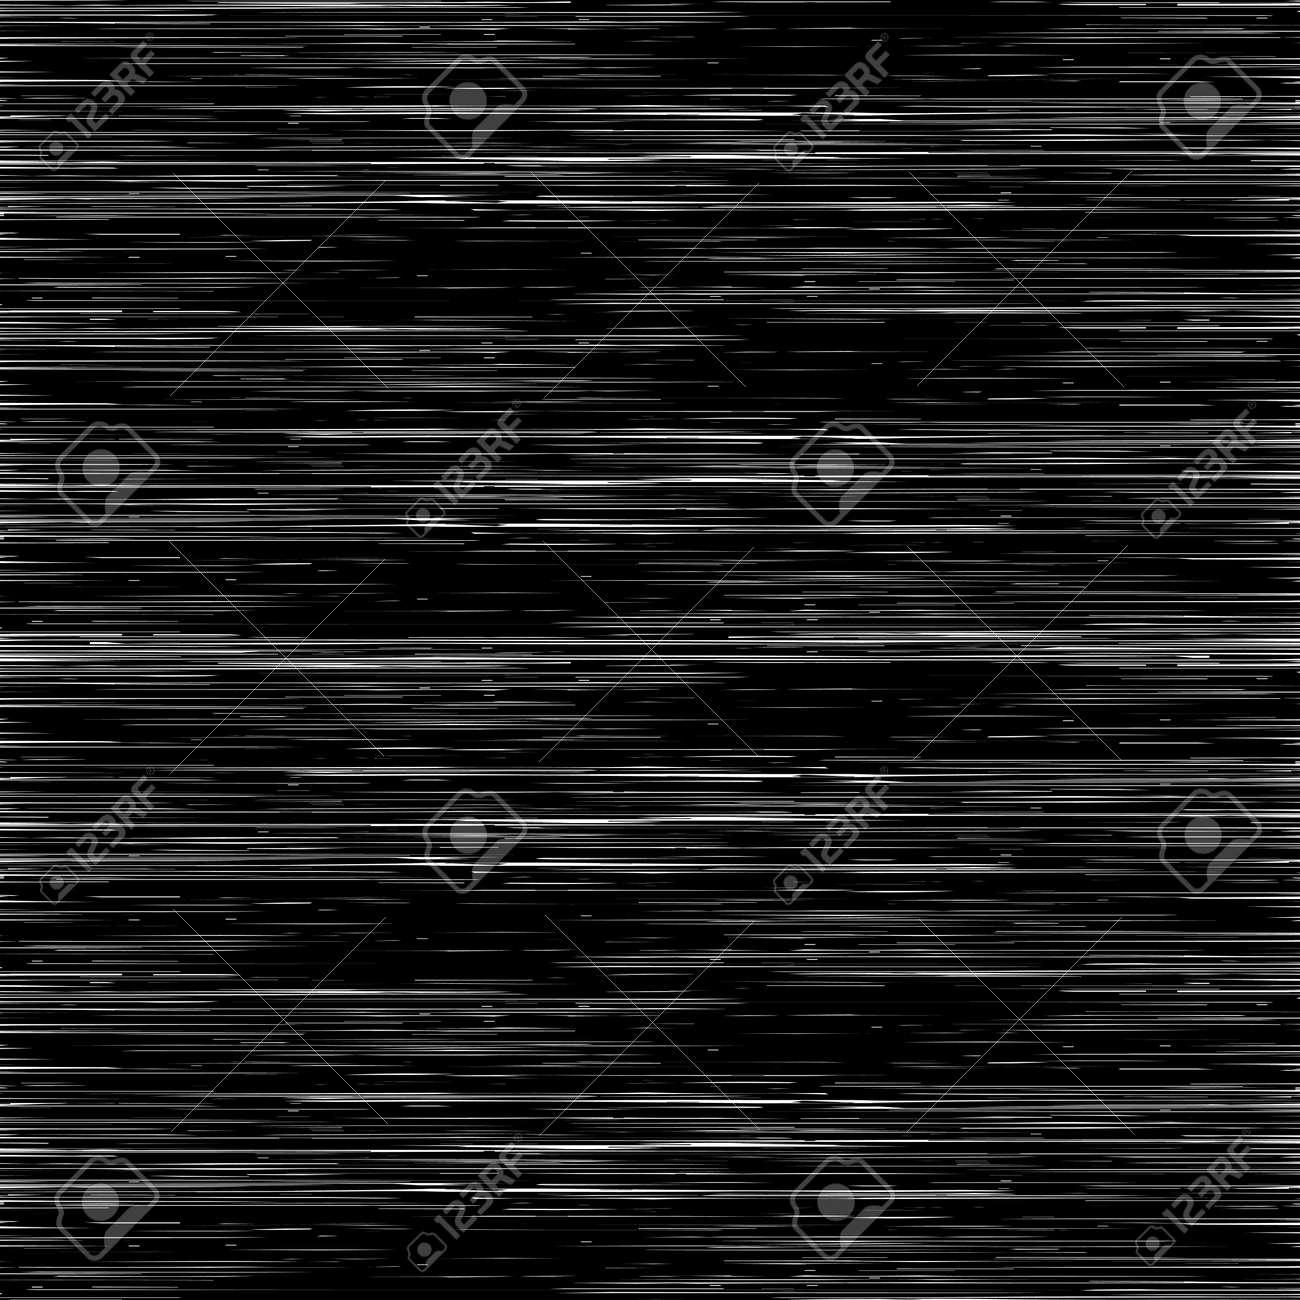 Abstract horizontal dark line background - stock vector - 155105019